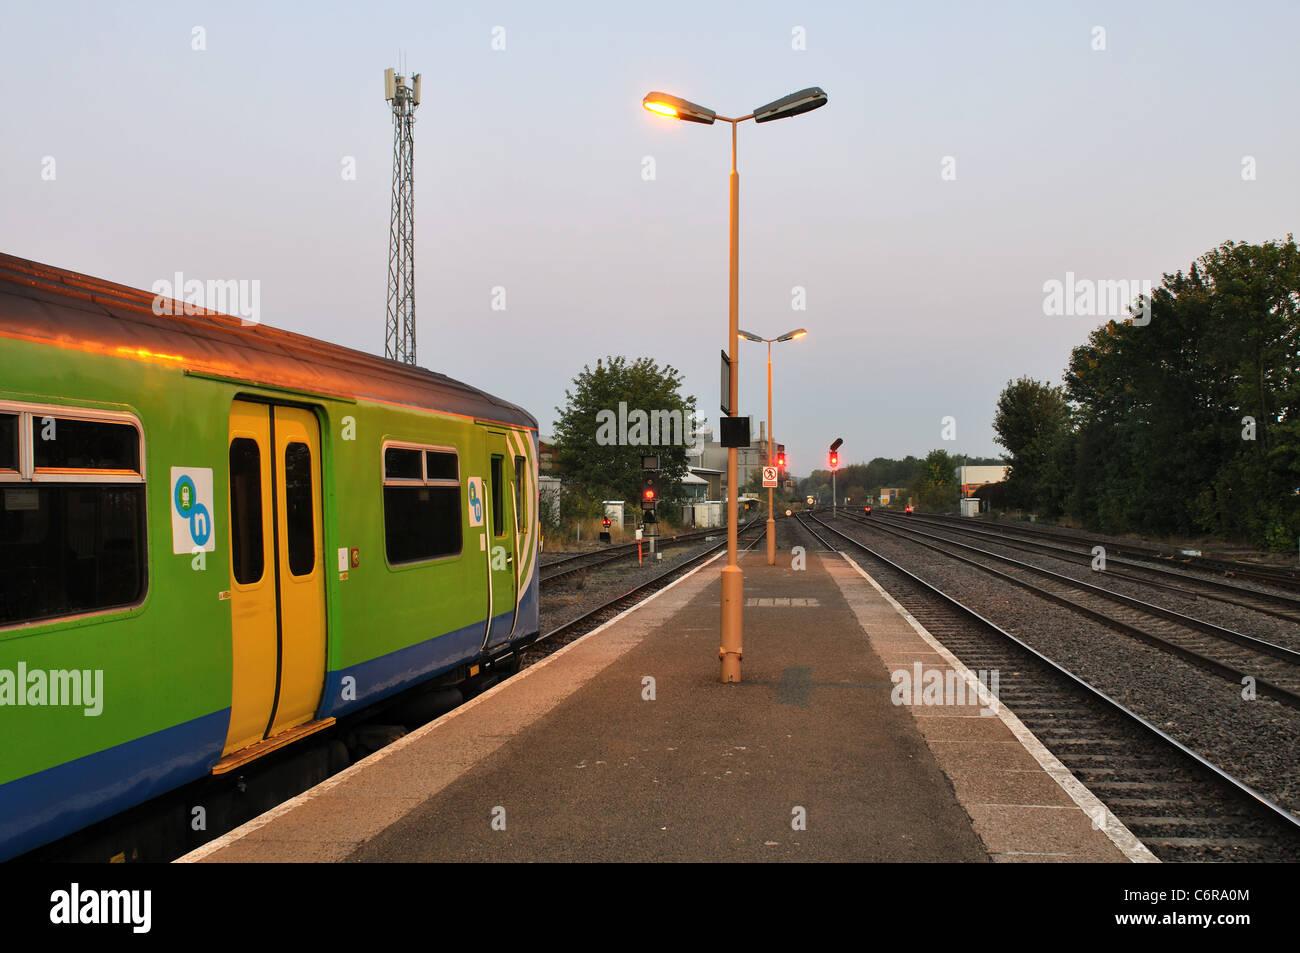 Network West Midlands train at Leamington Spa railway station, early morning, Warwickshire, England, UK - Stock Image